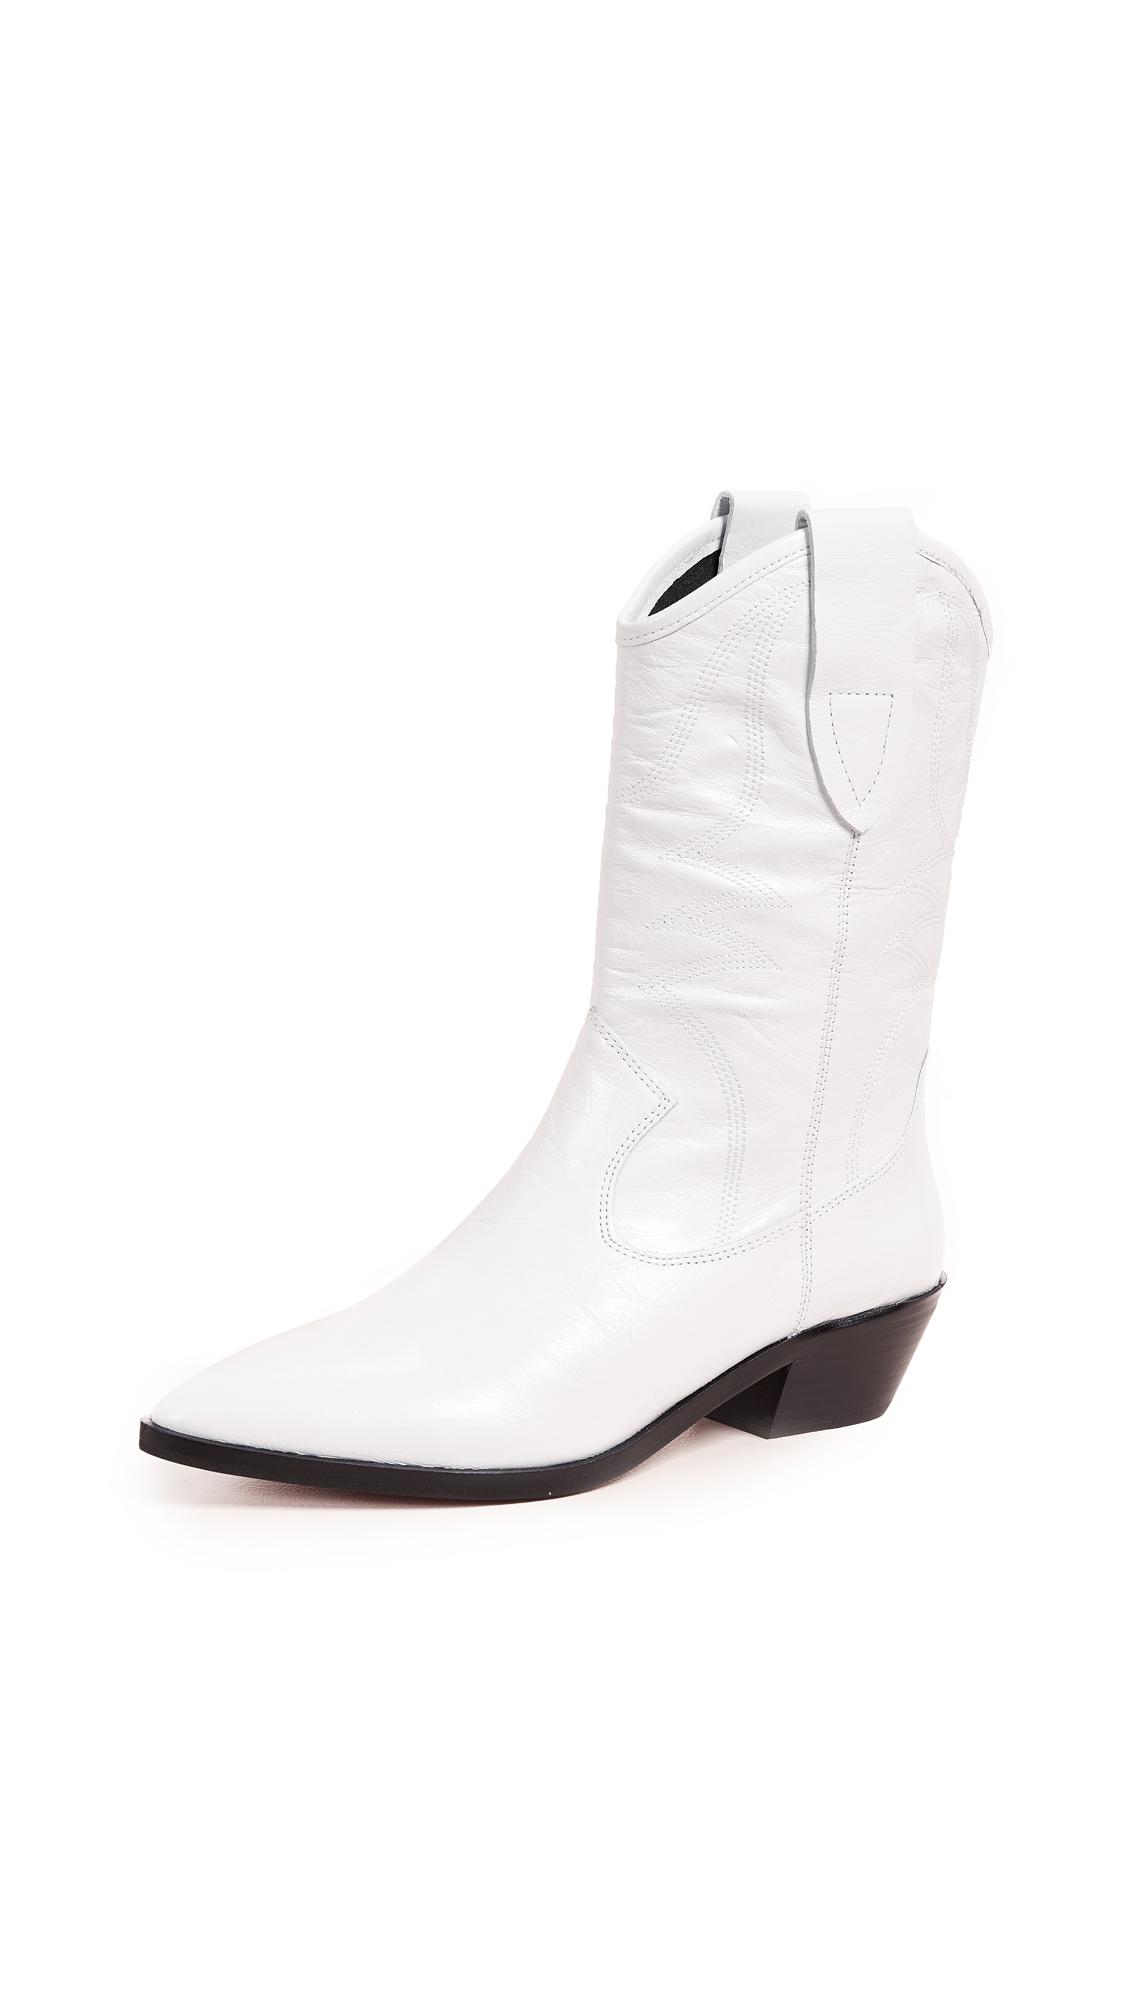 Rebecca Minkoff Kaiegan Western Boots - White